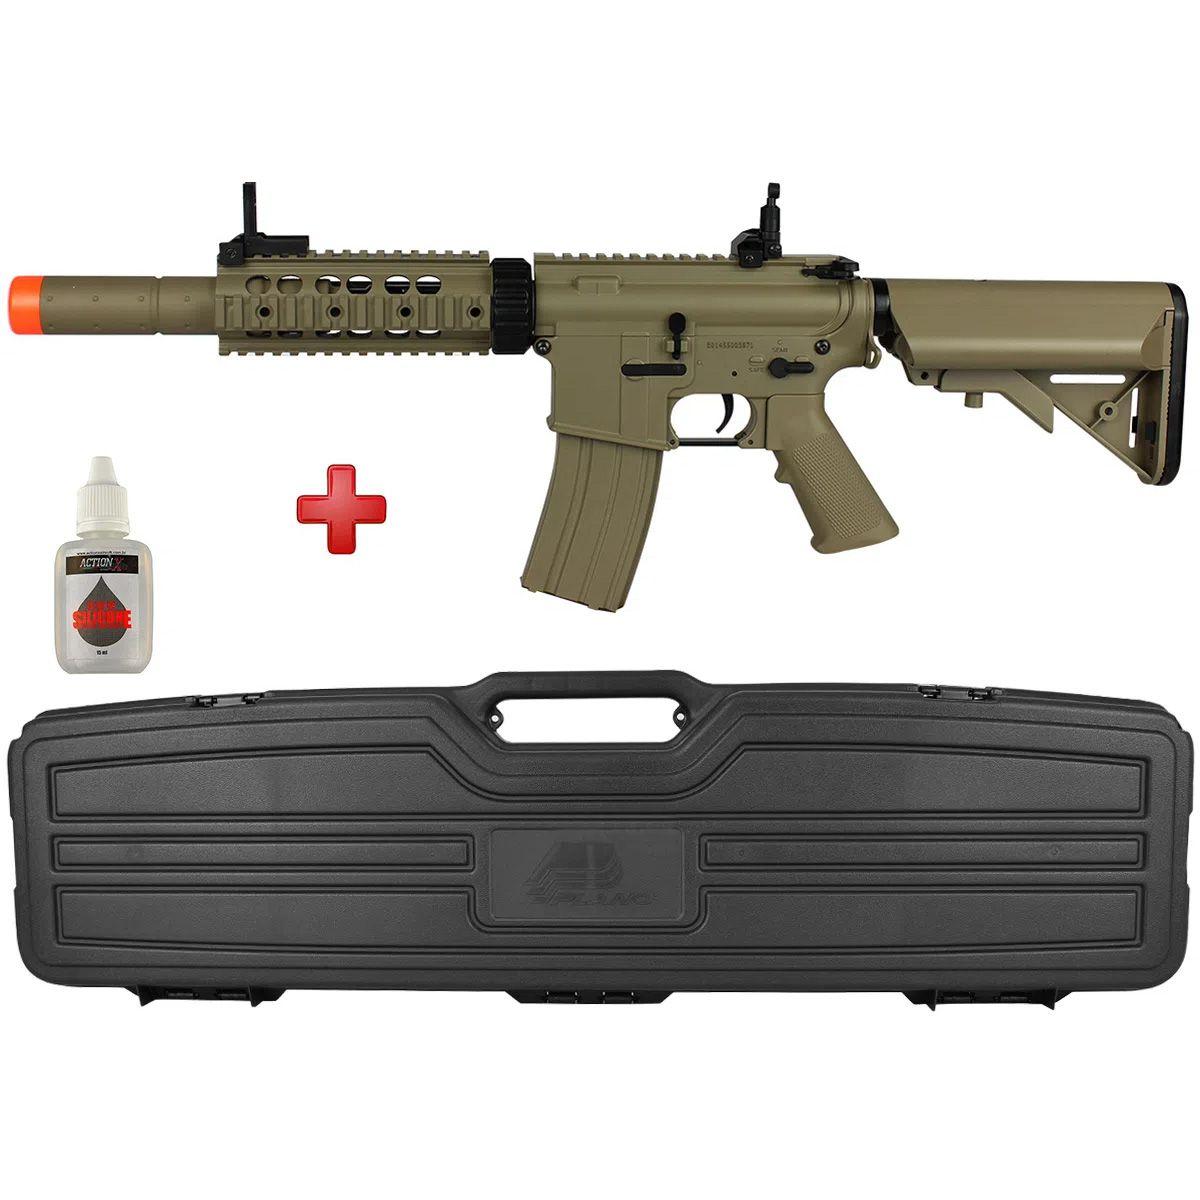 Rifle Airsoft Elétrico Cyma M4A1 TAN Bivolt + Case Plano 10142 + BRINDE Óleo de Silicone